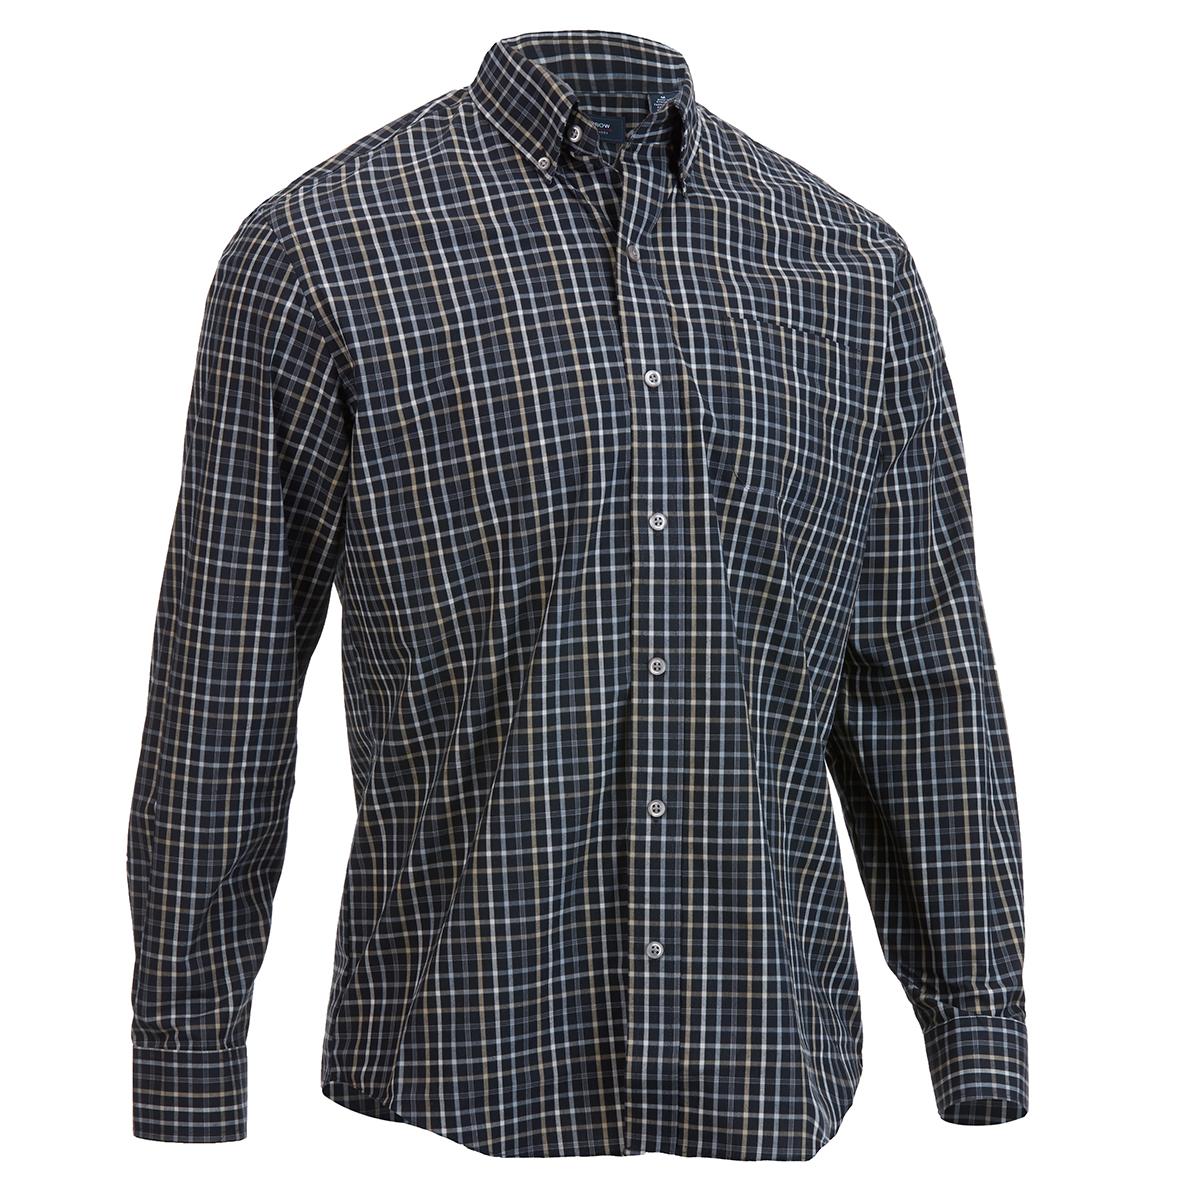 Arrow Men's Long-Sleeve Hamilton Poplin Button-Down Shirt - Black, M